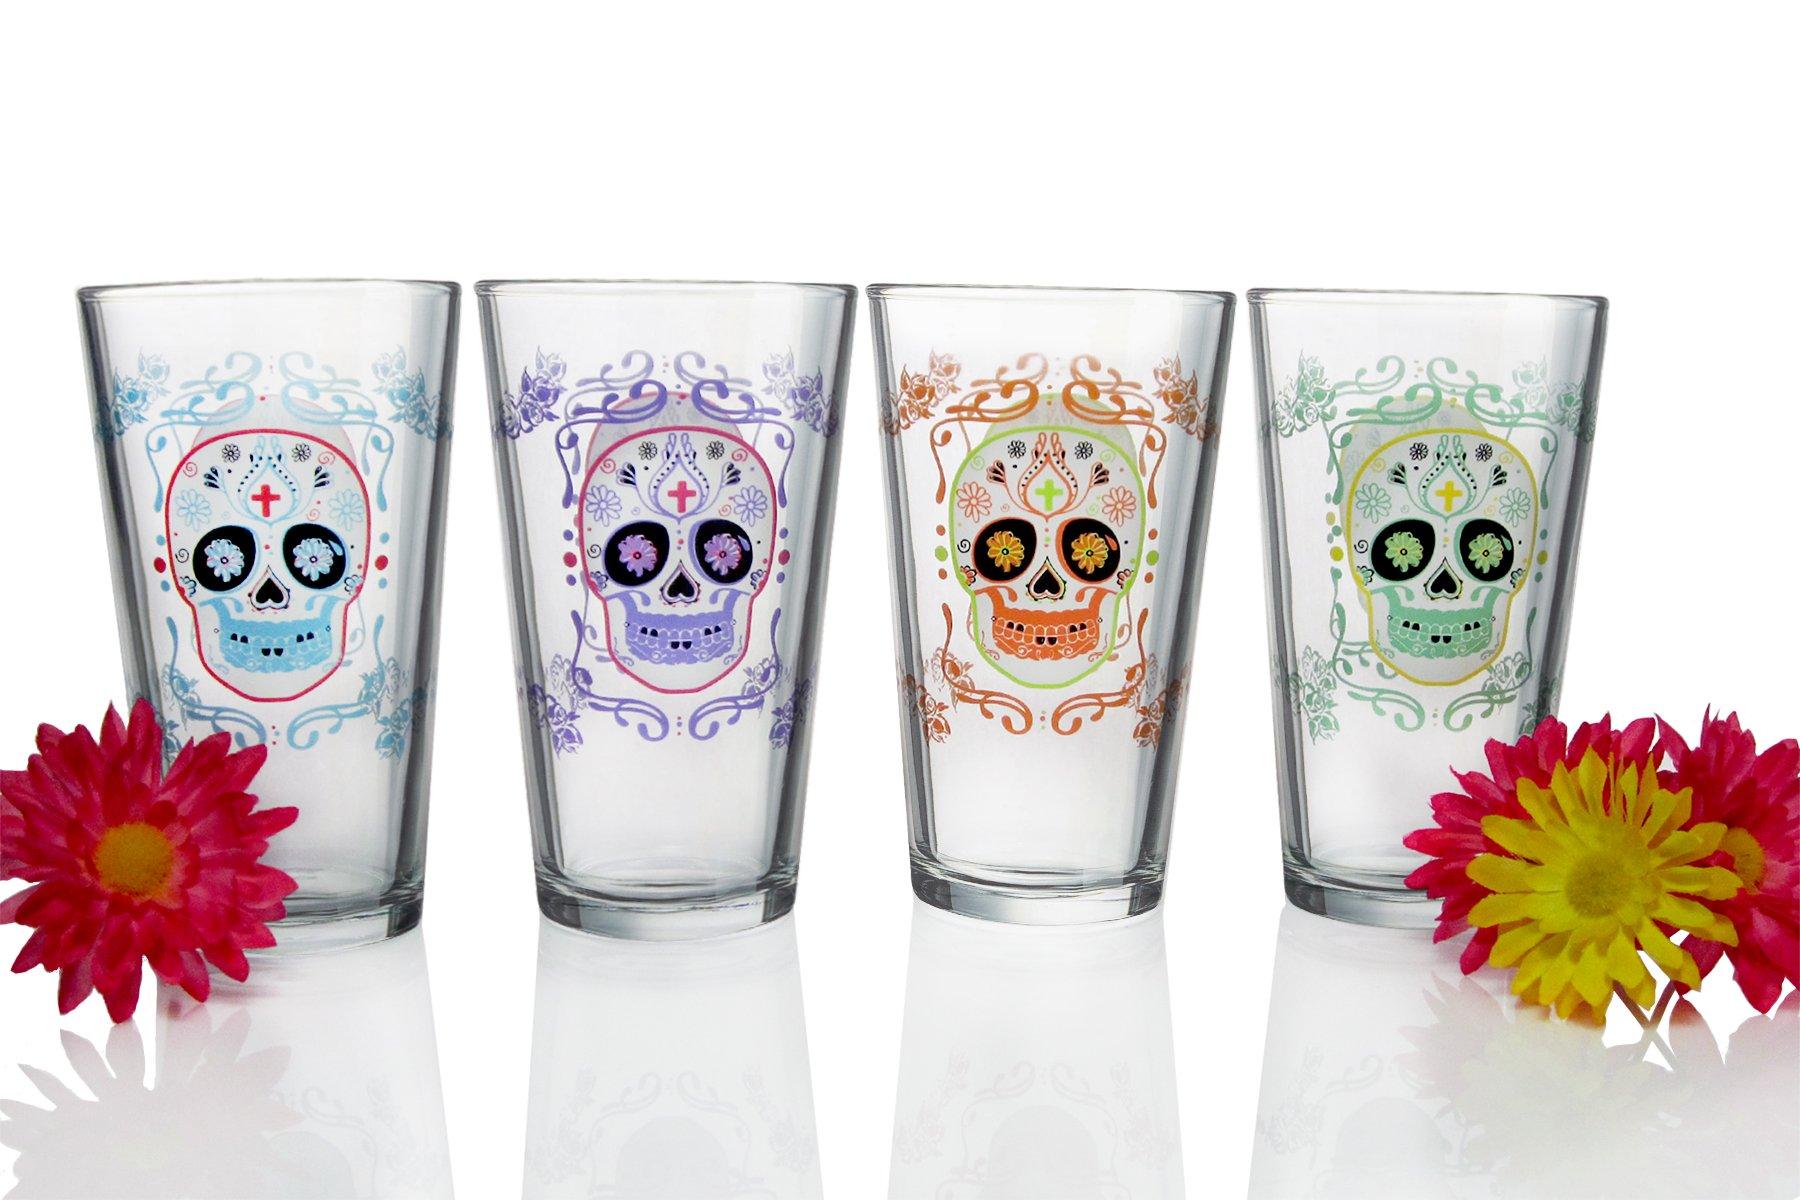 Luminarc Sugar Skulls Assorted Decorated Pub Glasses (Set of 4), 16 oz, Clear by Luminarc (Image #1)